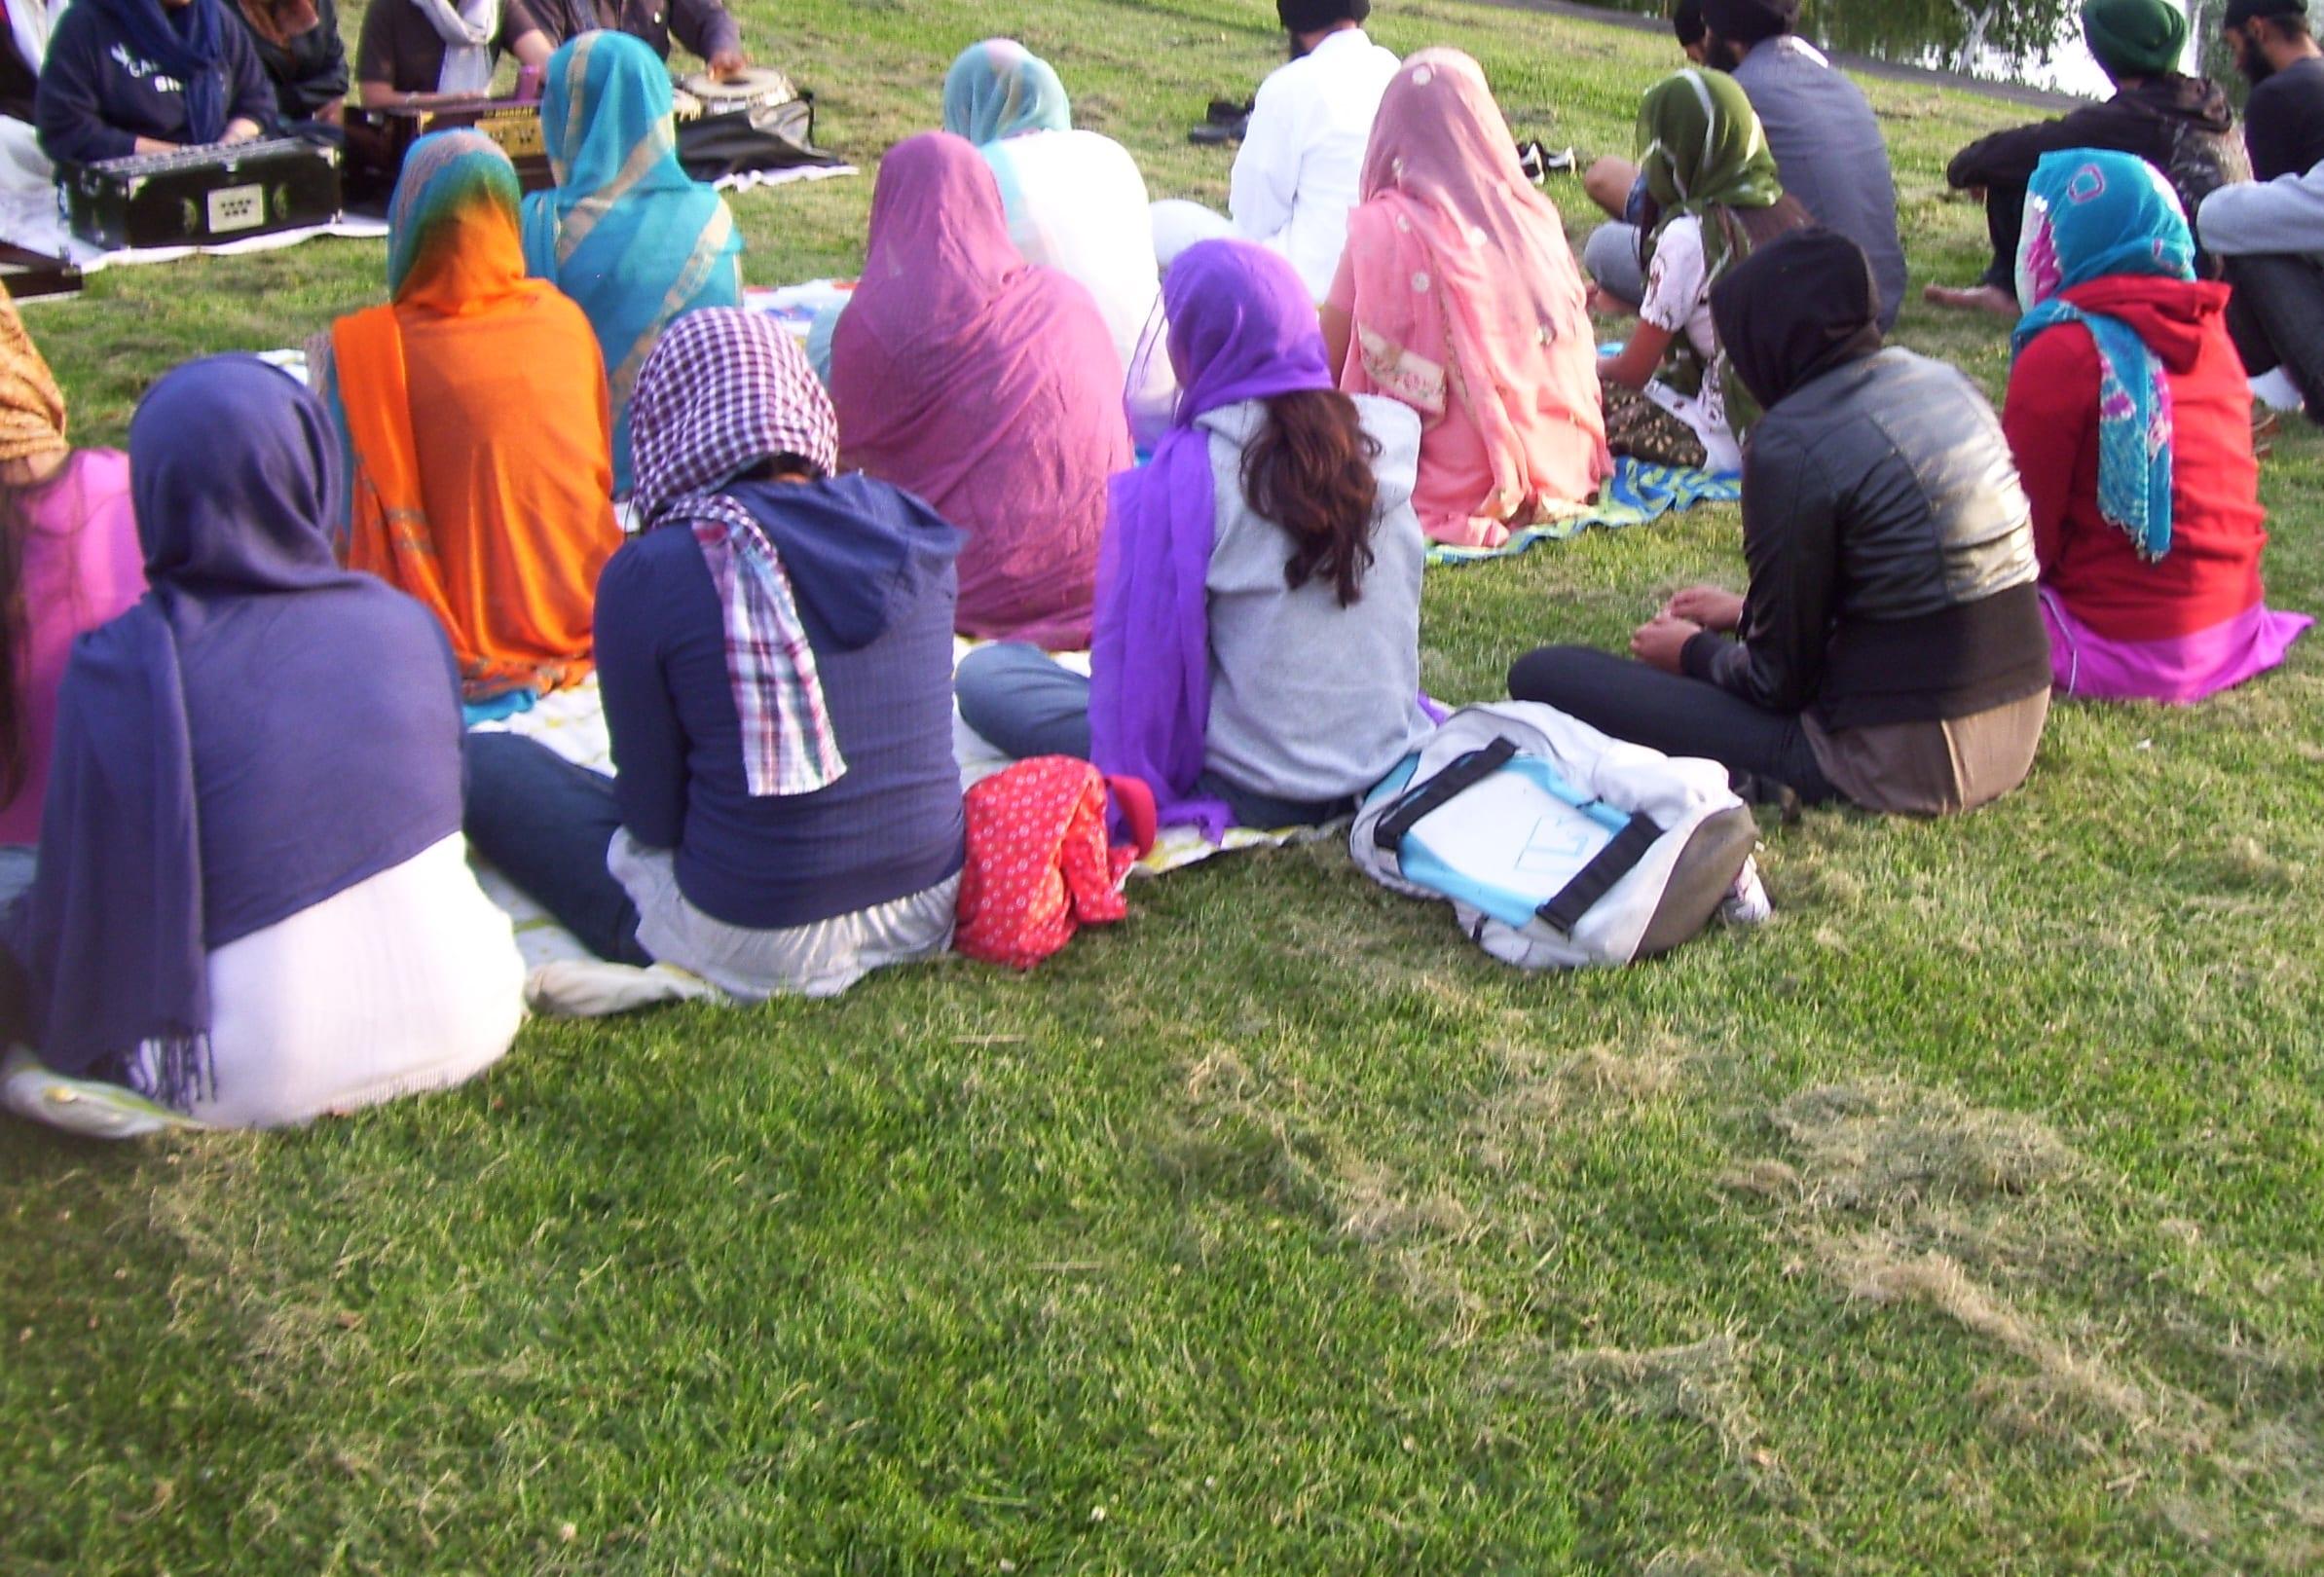 Fantastic Sikh Women Dress Code Sikh State Dress Code Of